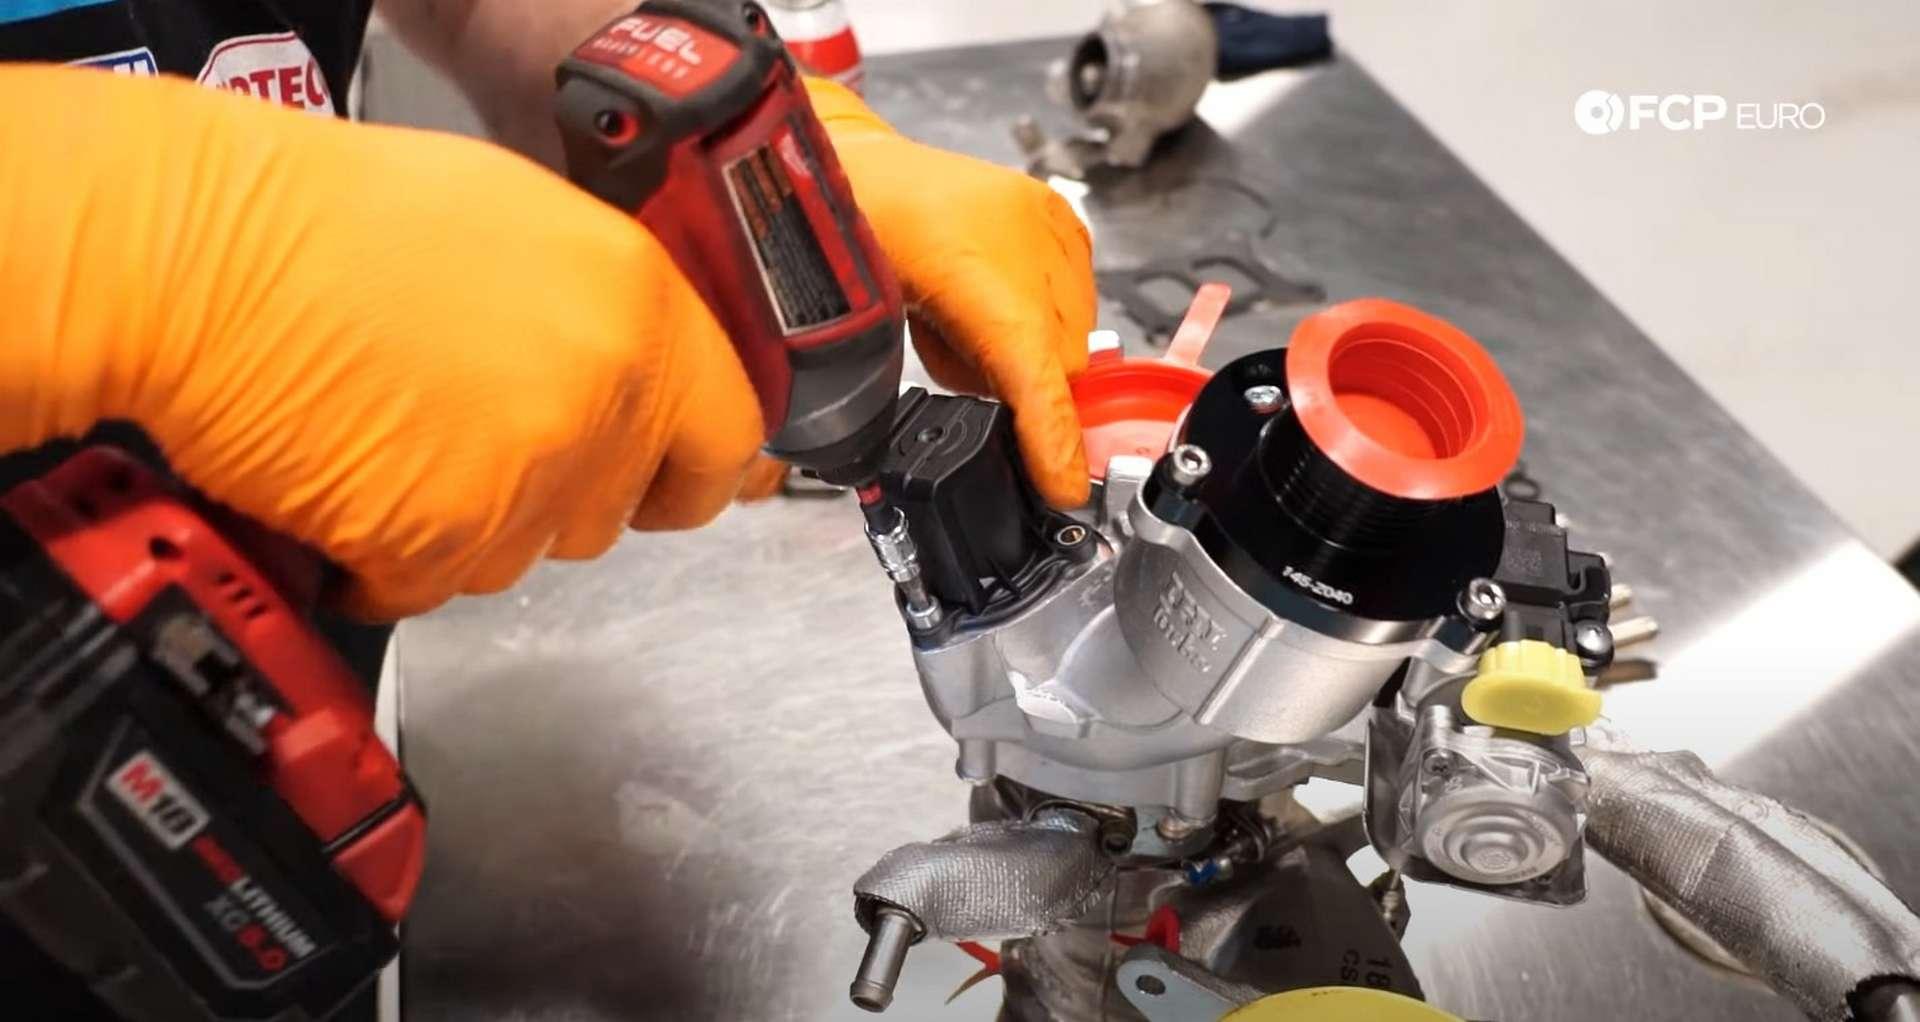 DIY MK7 VW GTI Turbocharger Upgrade removing the diverter valve